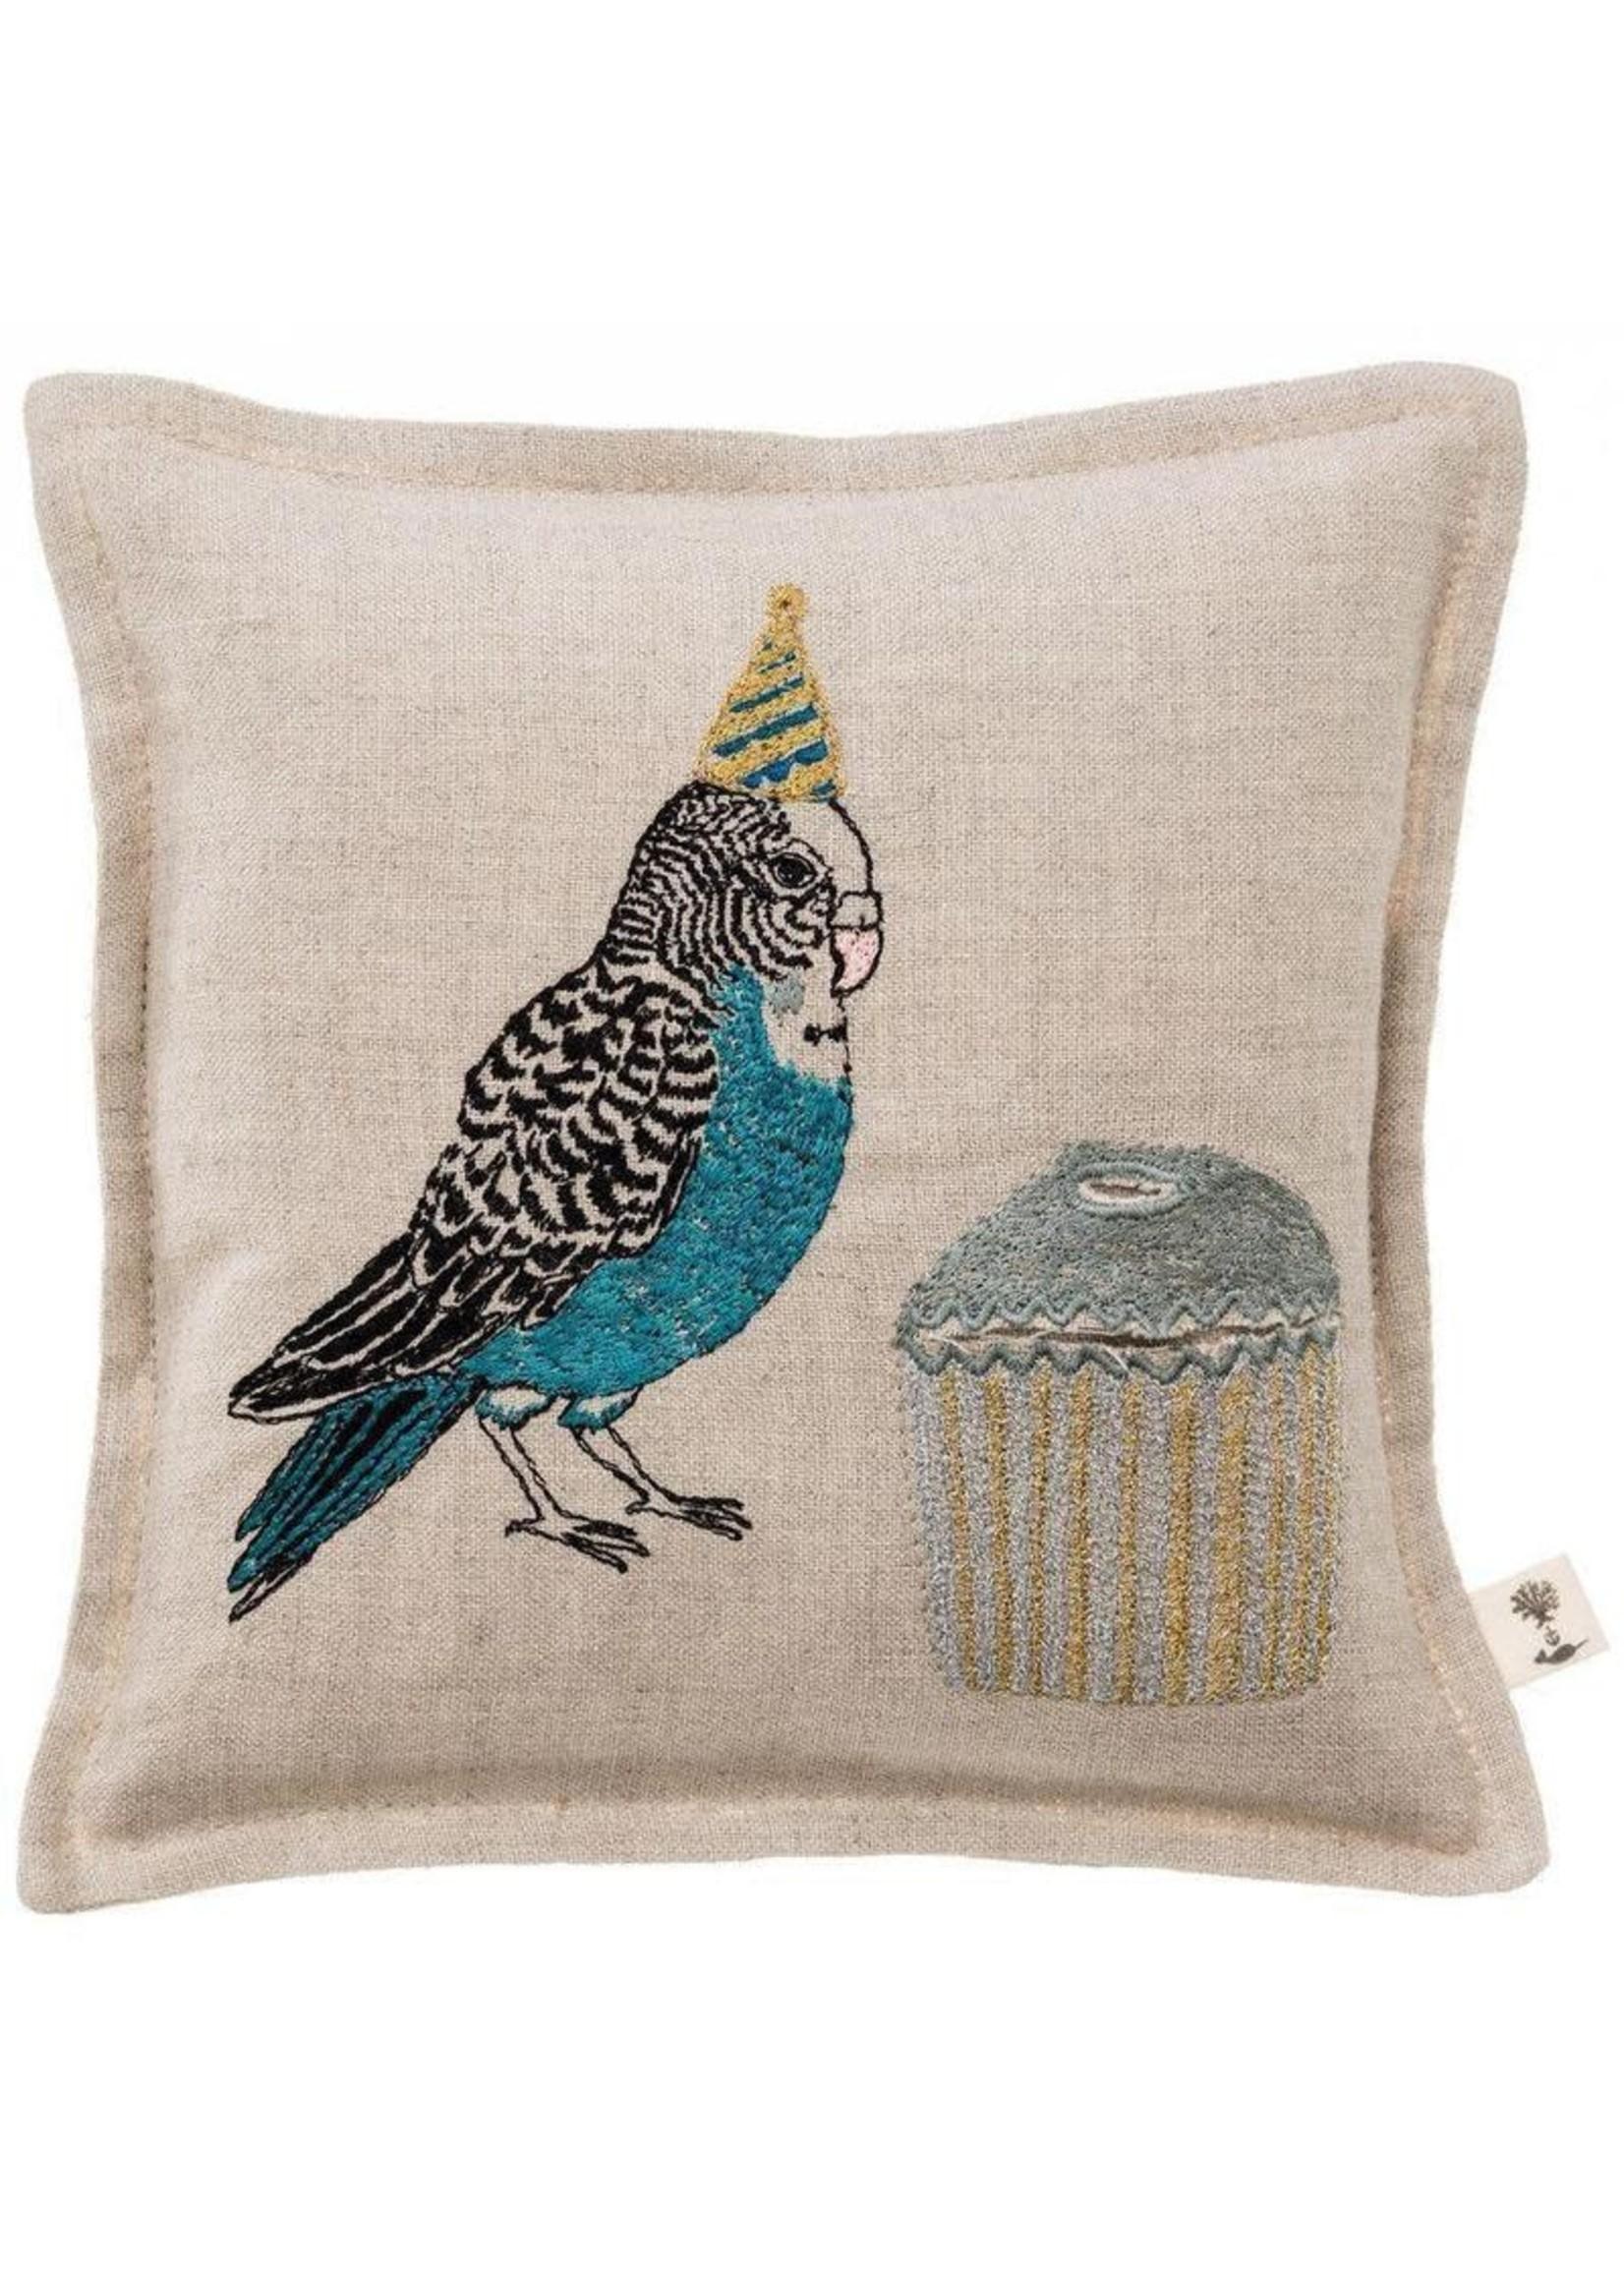 Coral and Tusk Pillow - 7x7 - Birthday Parakeet